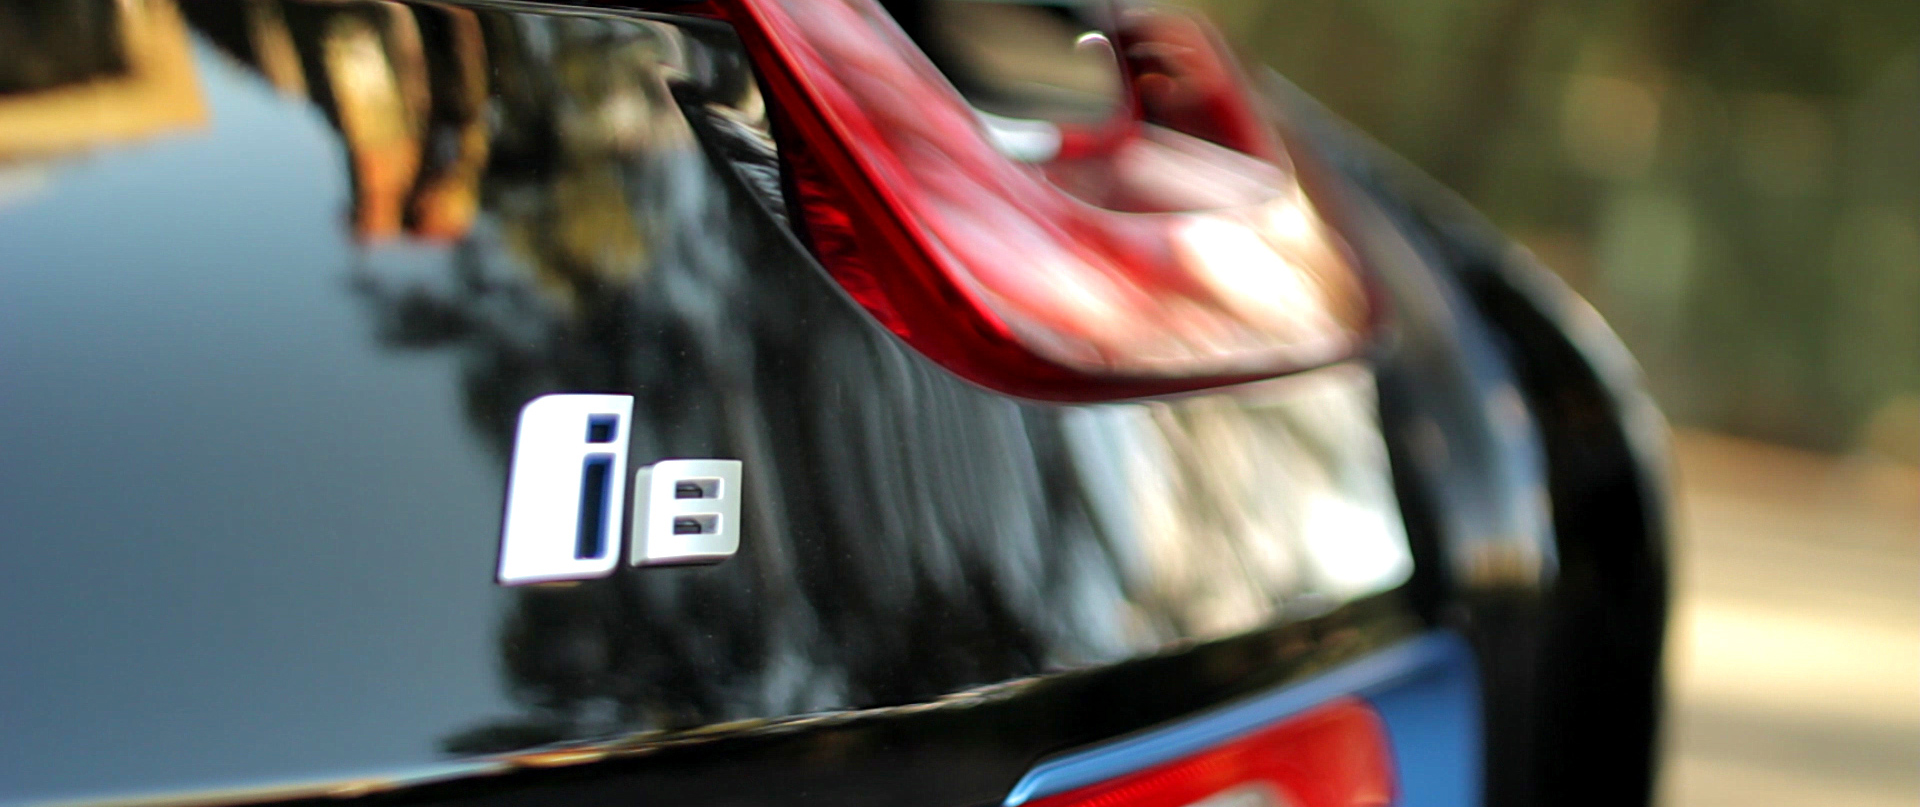 BMW i8 10.jpg